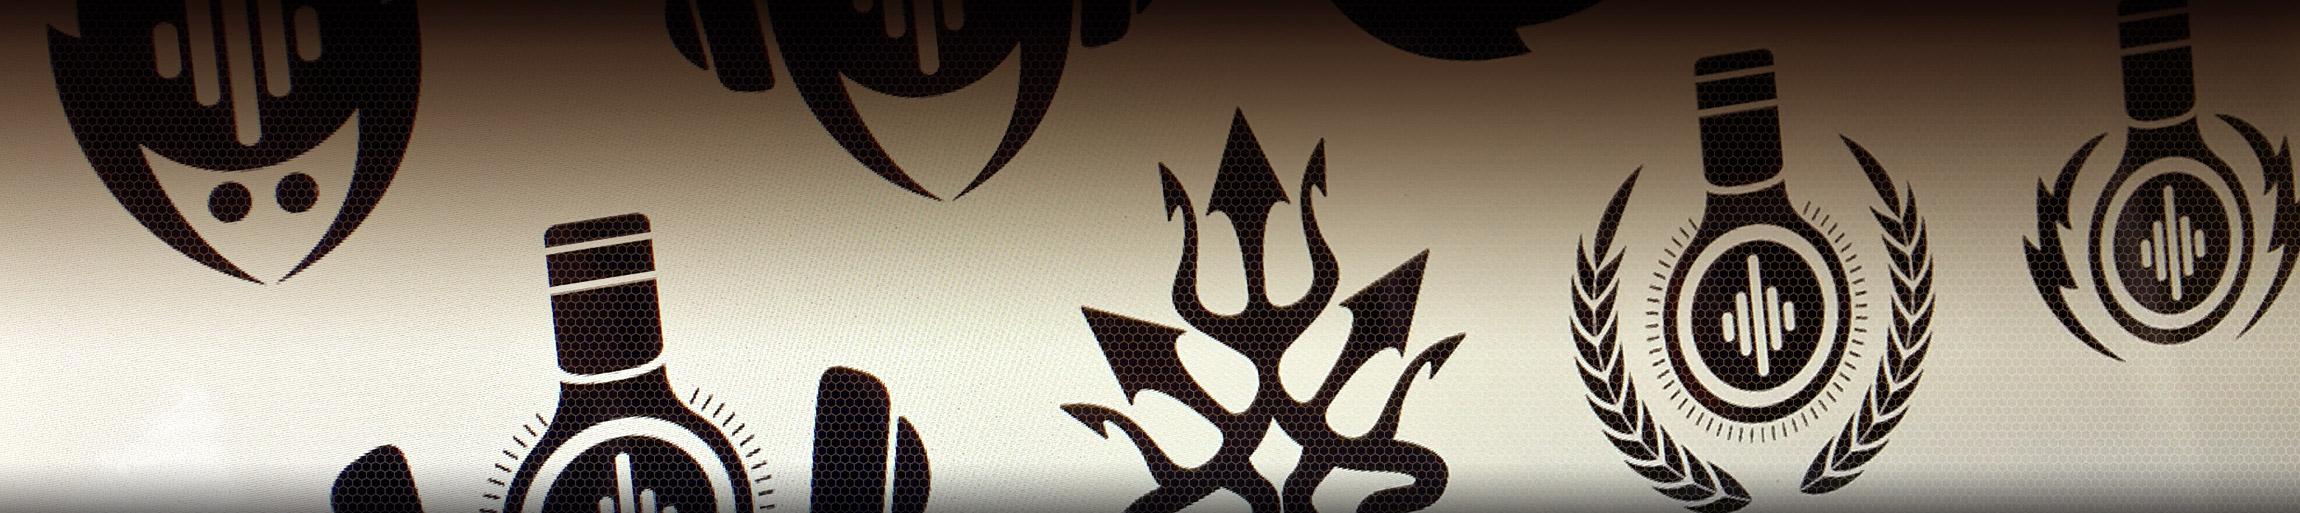 Identity / Logo Design Header Plantronics Icon - Graphic Regime